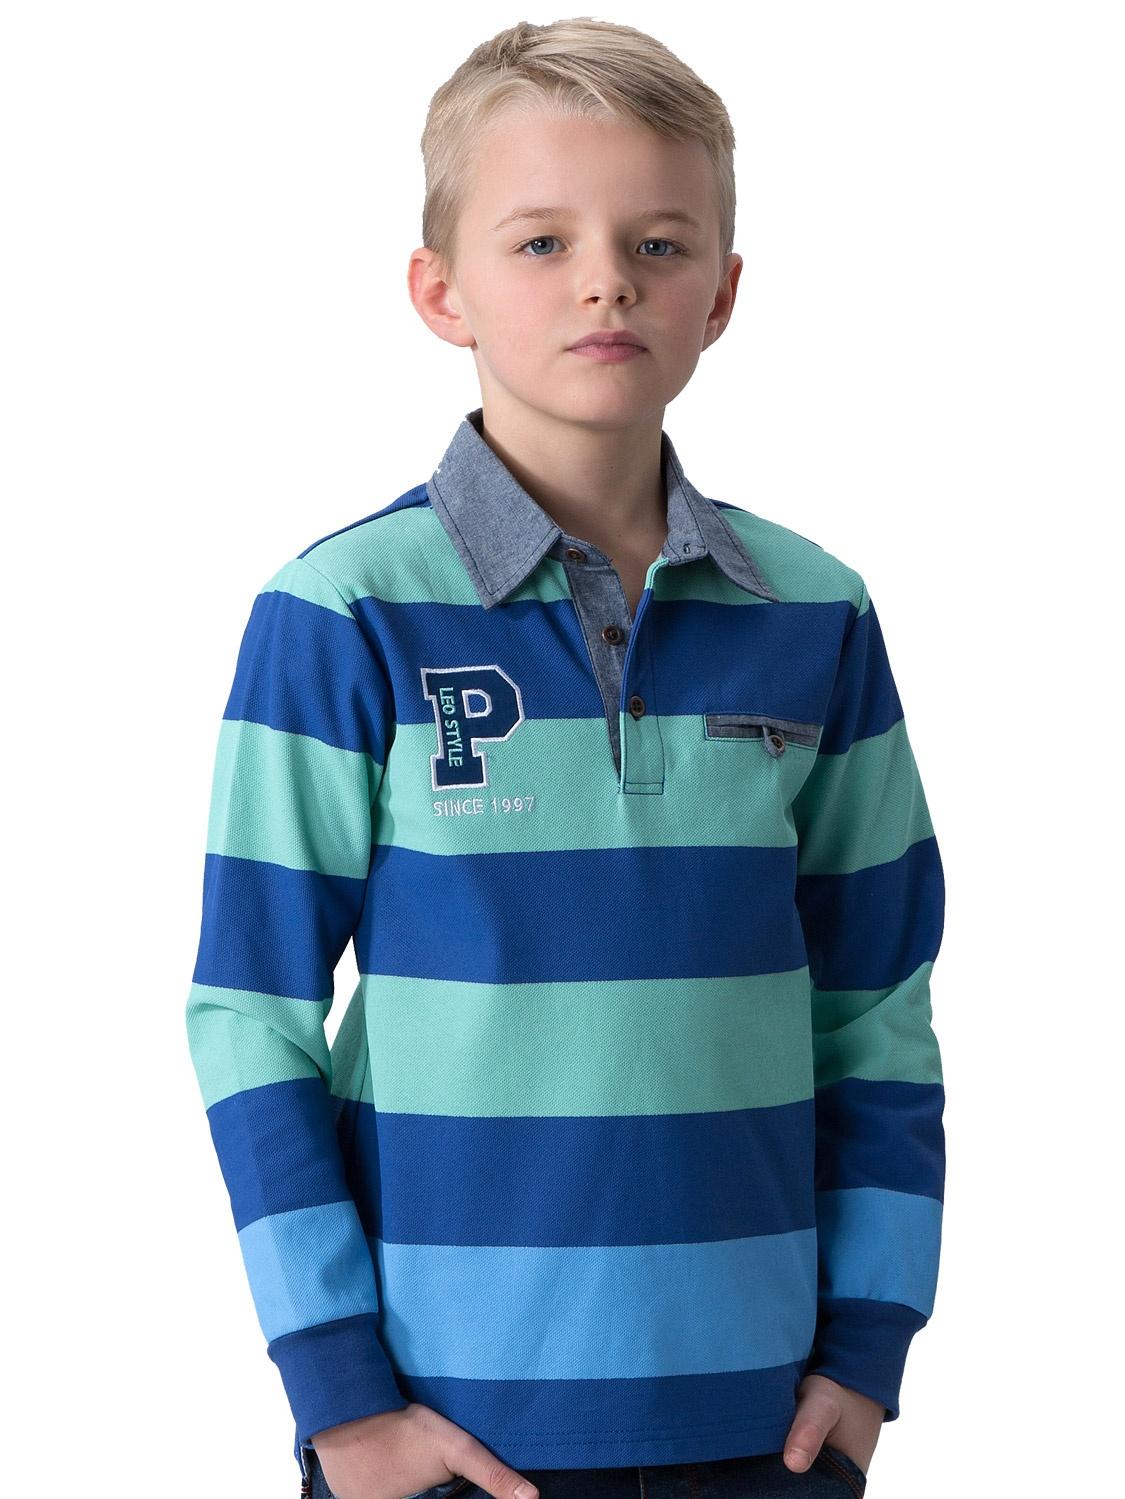 Leo&Lily Big Boys' Kids Yarn Dyed Polo Shirts Chambary CollarsT-Shirt